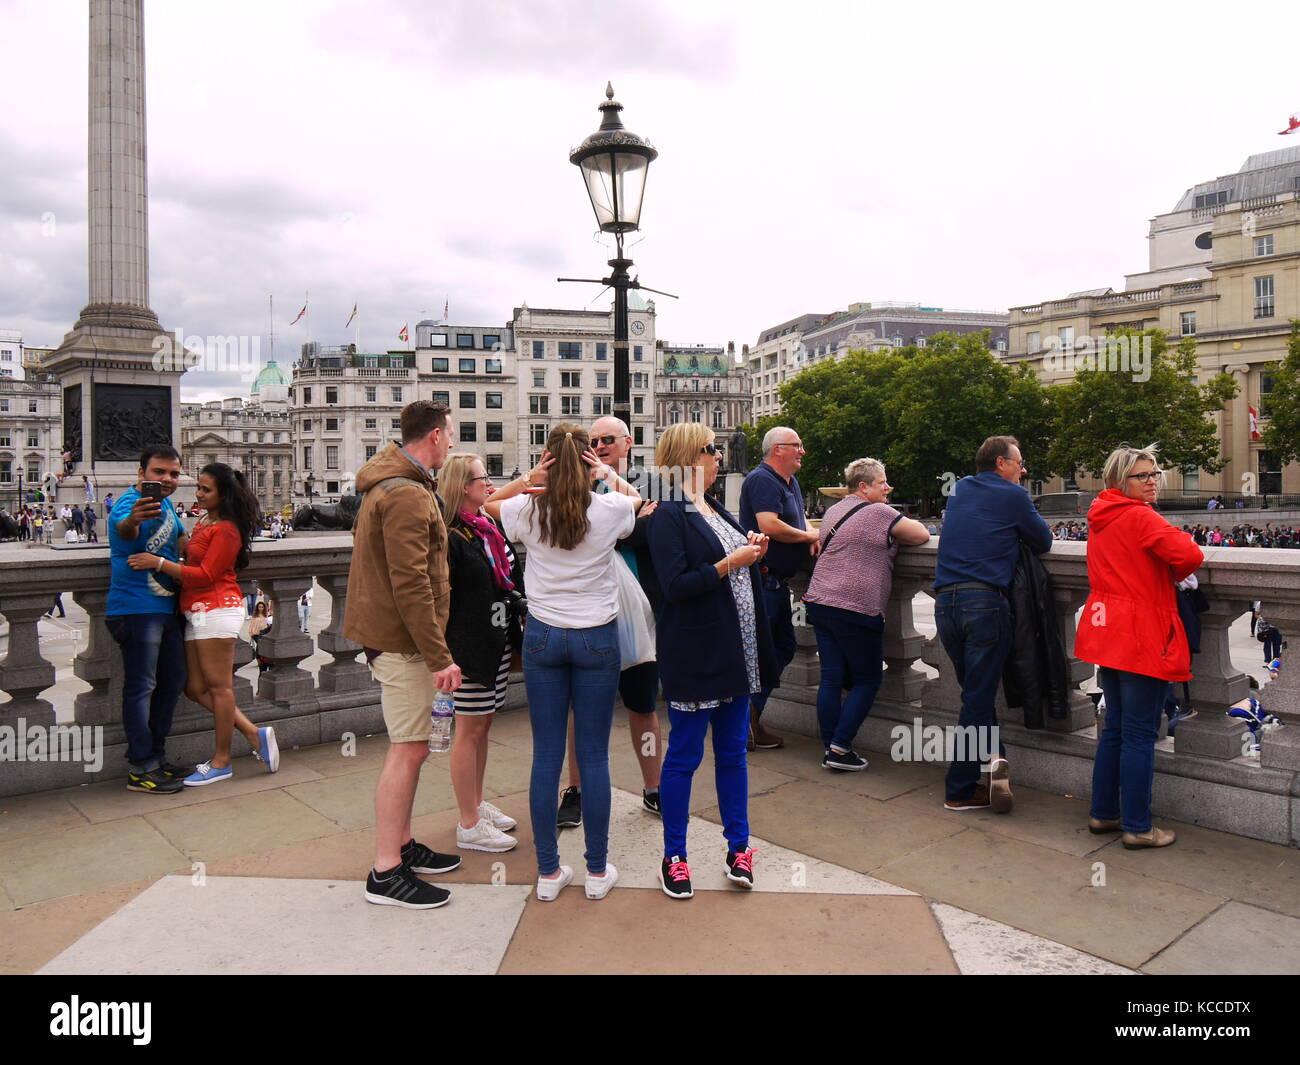 Trafalgar Square London - Stock Image